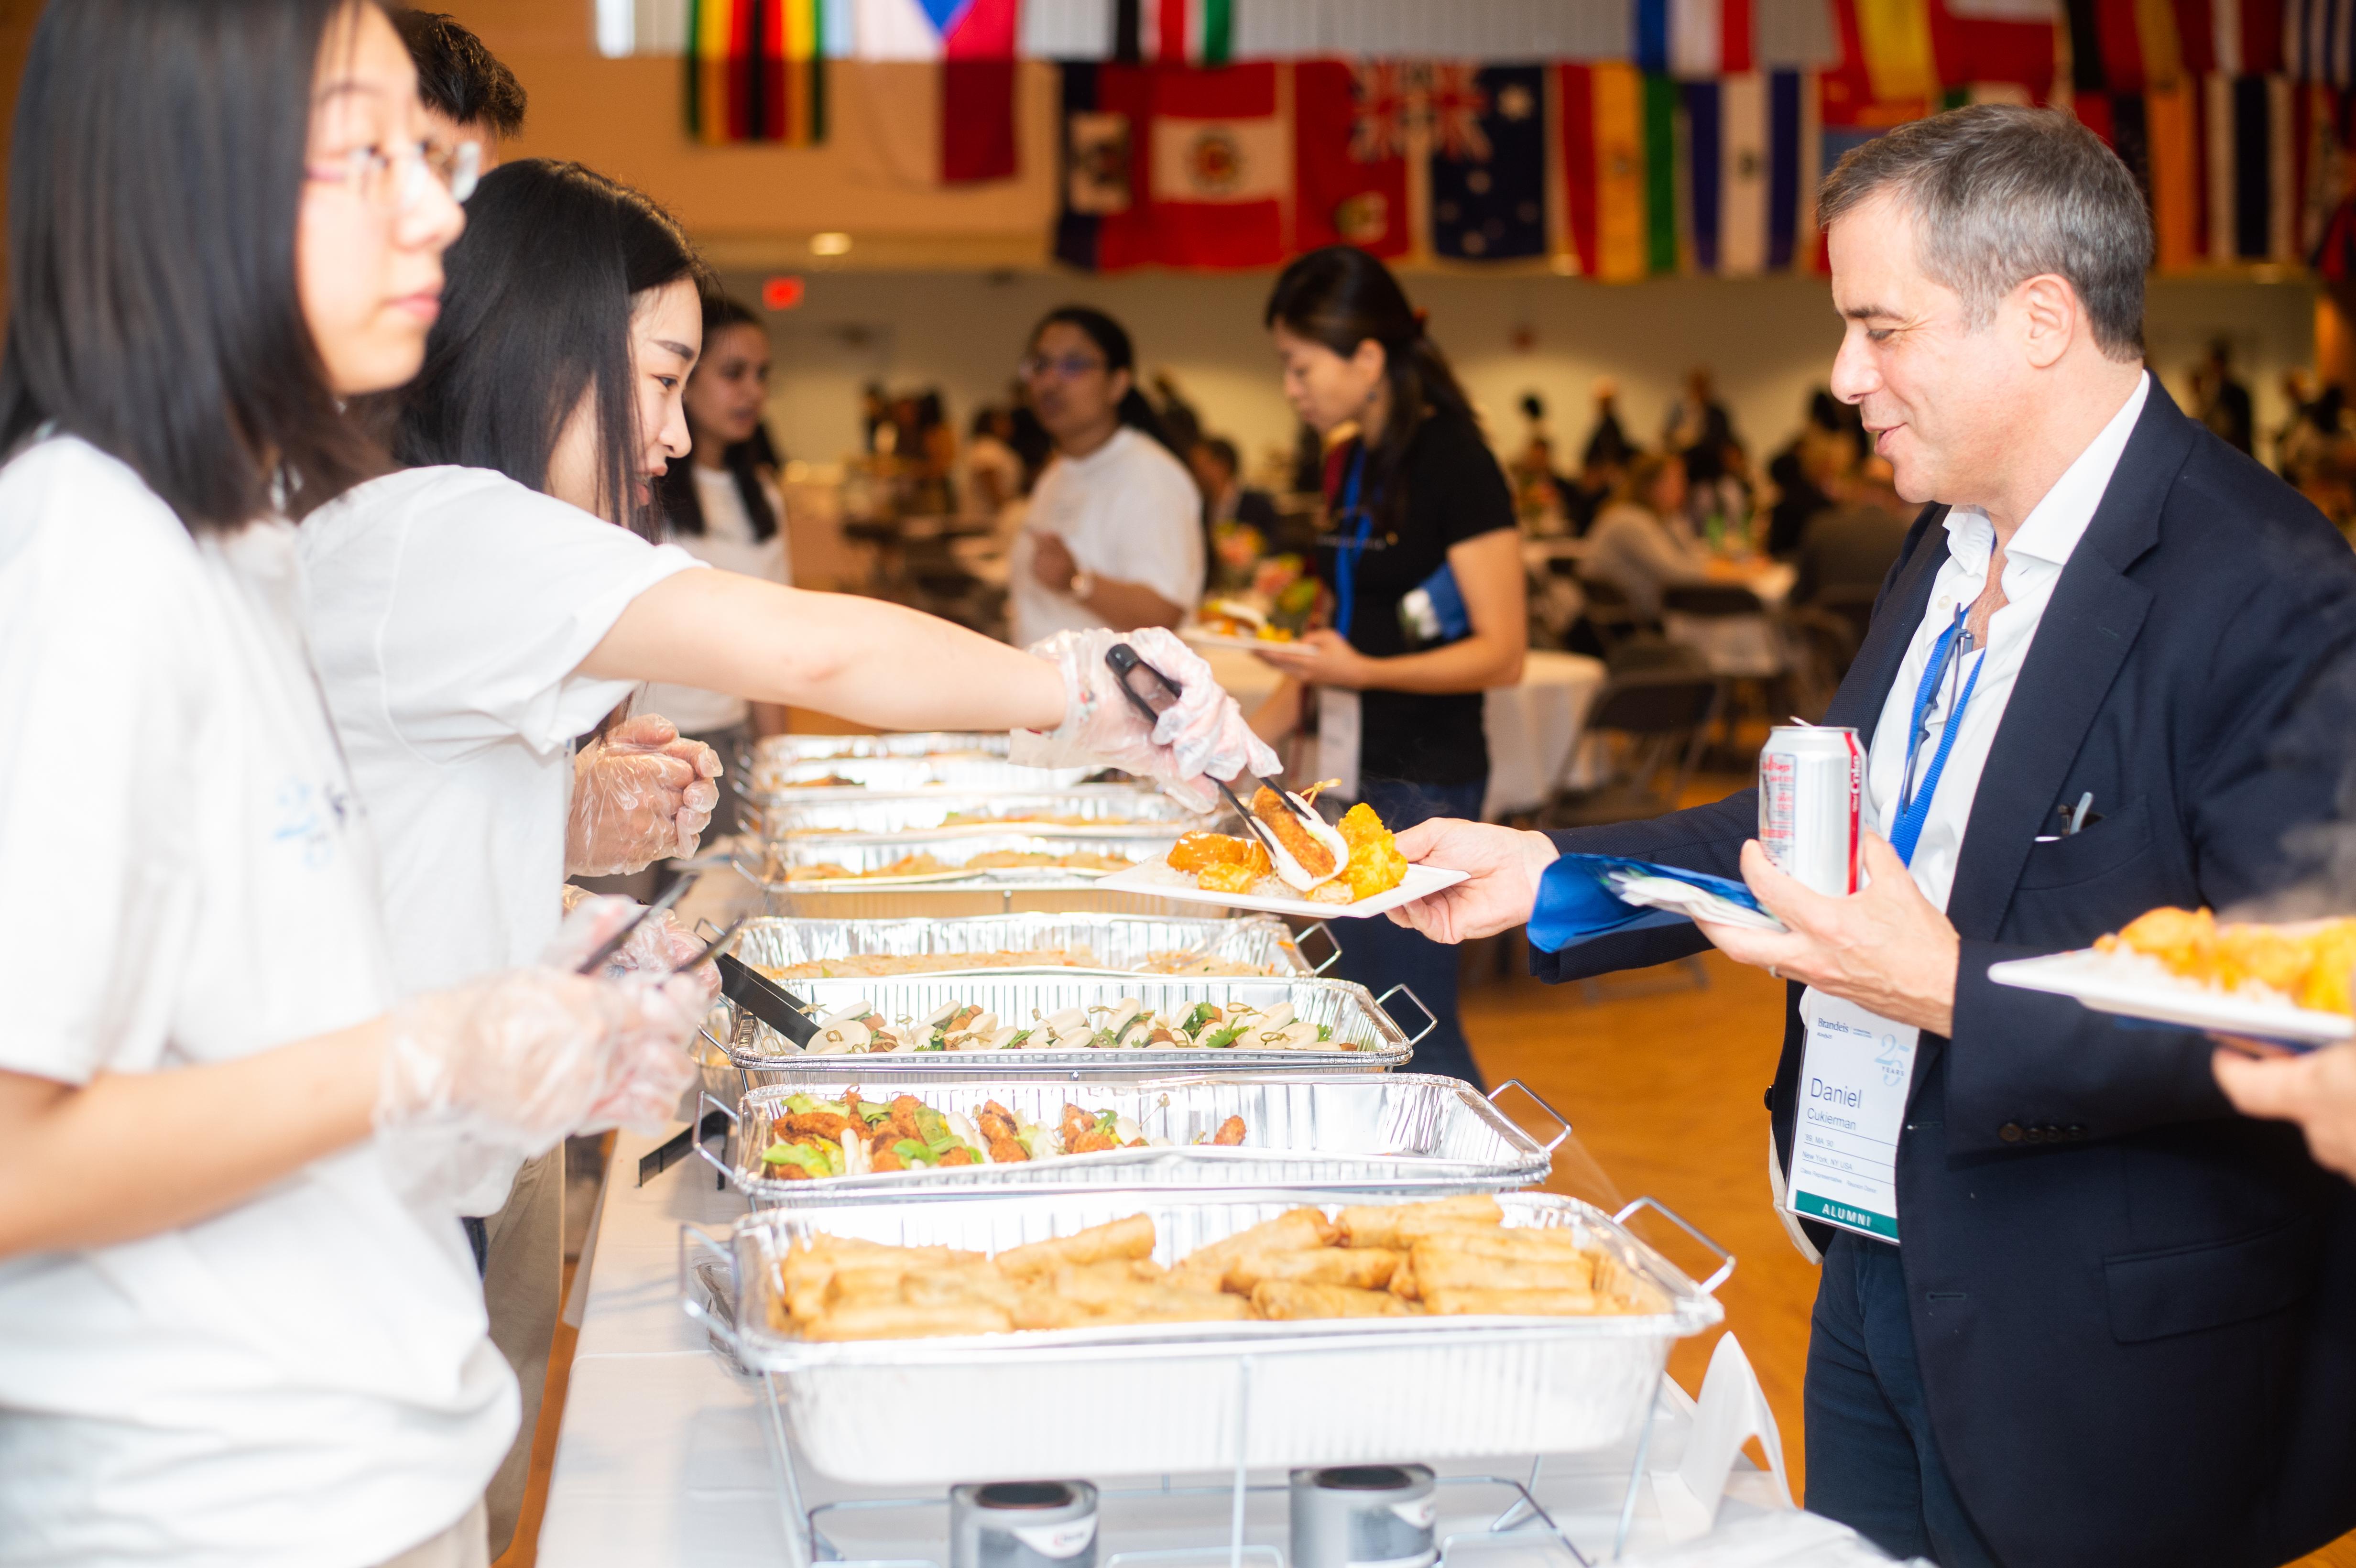 Reunion Weekend: International Food Lunch and Kids' Activities